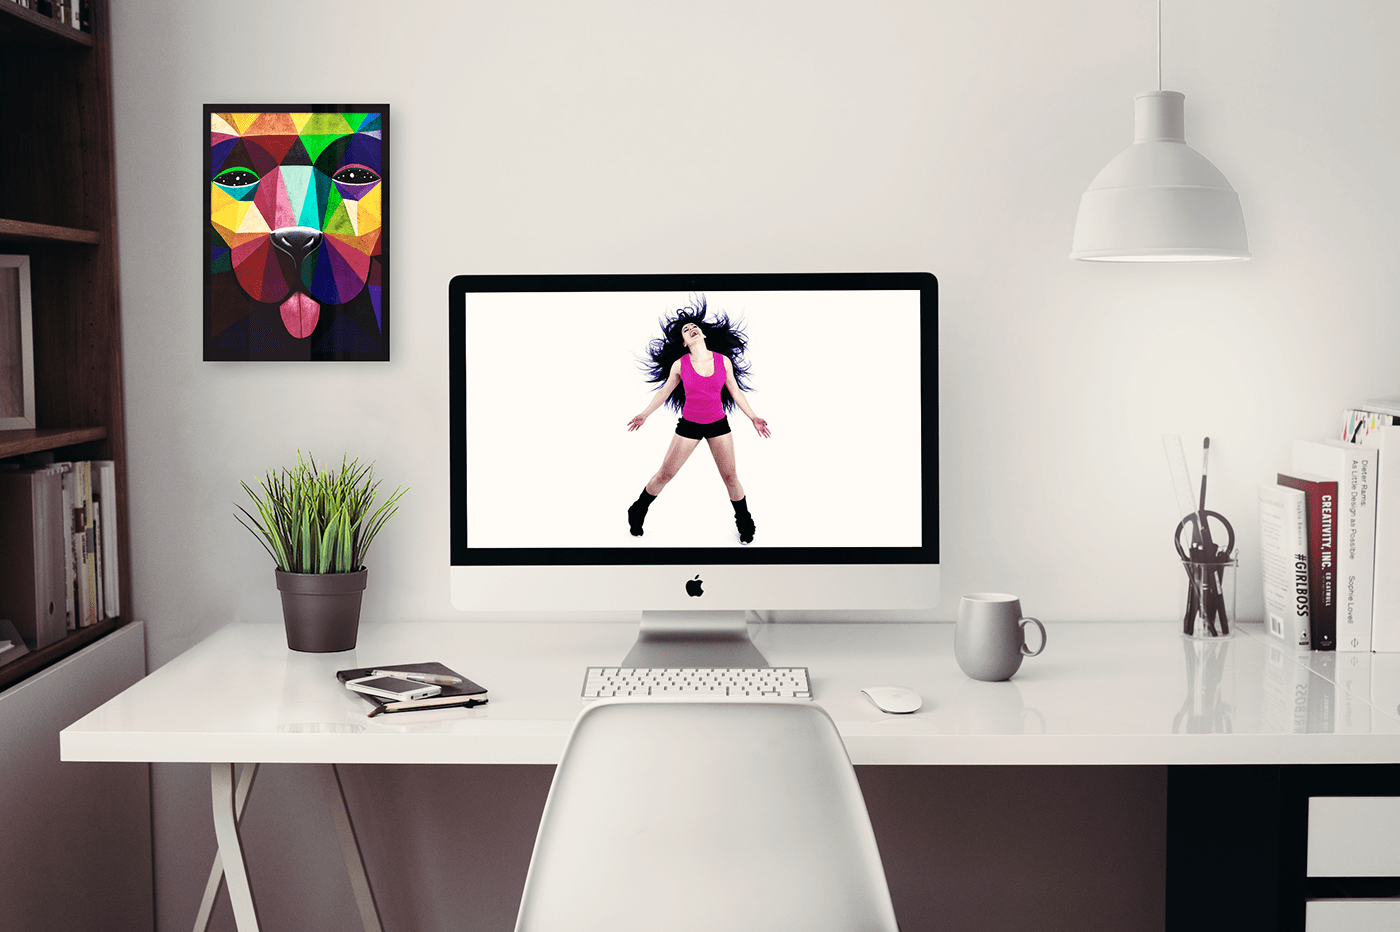 Adobe Portfolio Baileactivo photoshop Illustrator InDesign